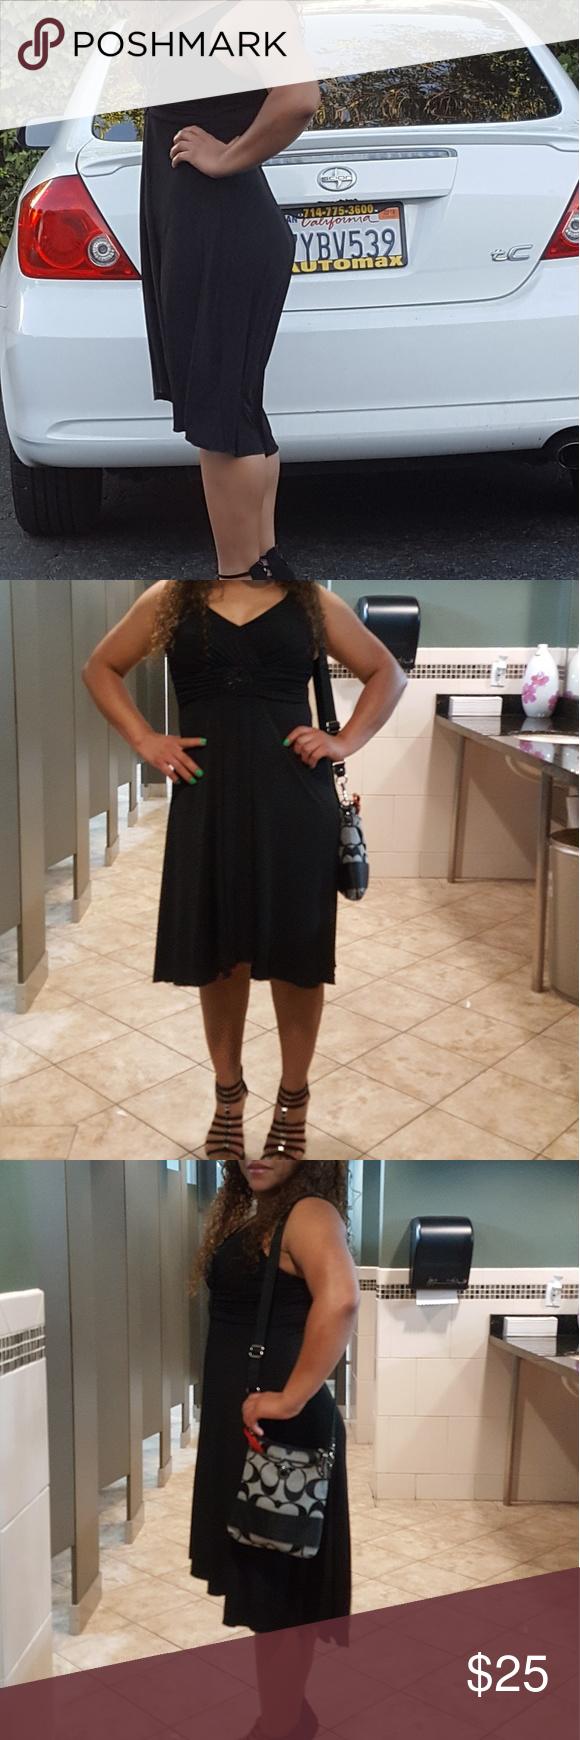 Enfocus Studio Black Maxi Dress Stretchy Black Maxi Dress Clothes Design Maxi Dress [ 1740 x 580 Pixel ]